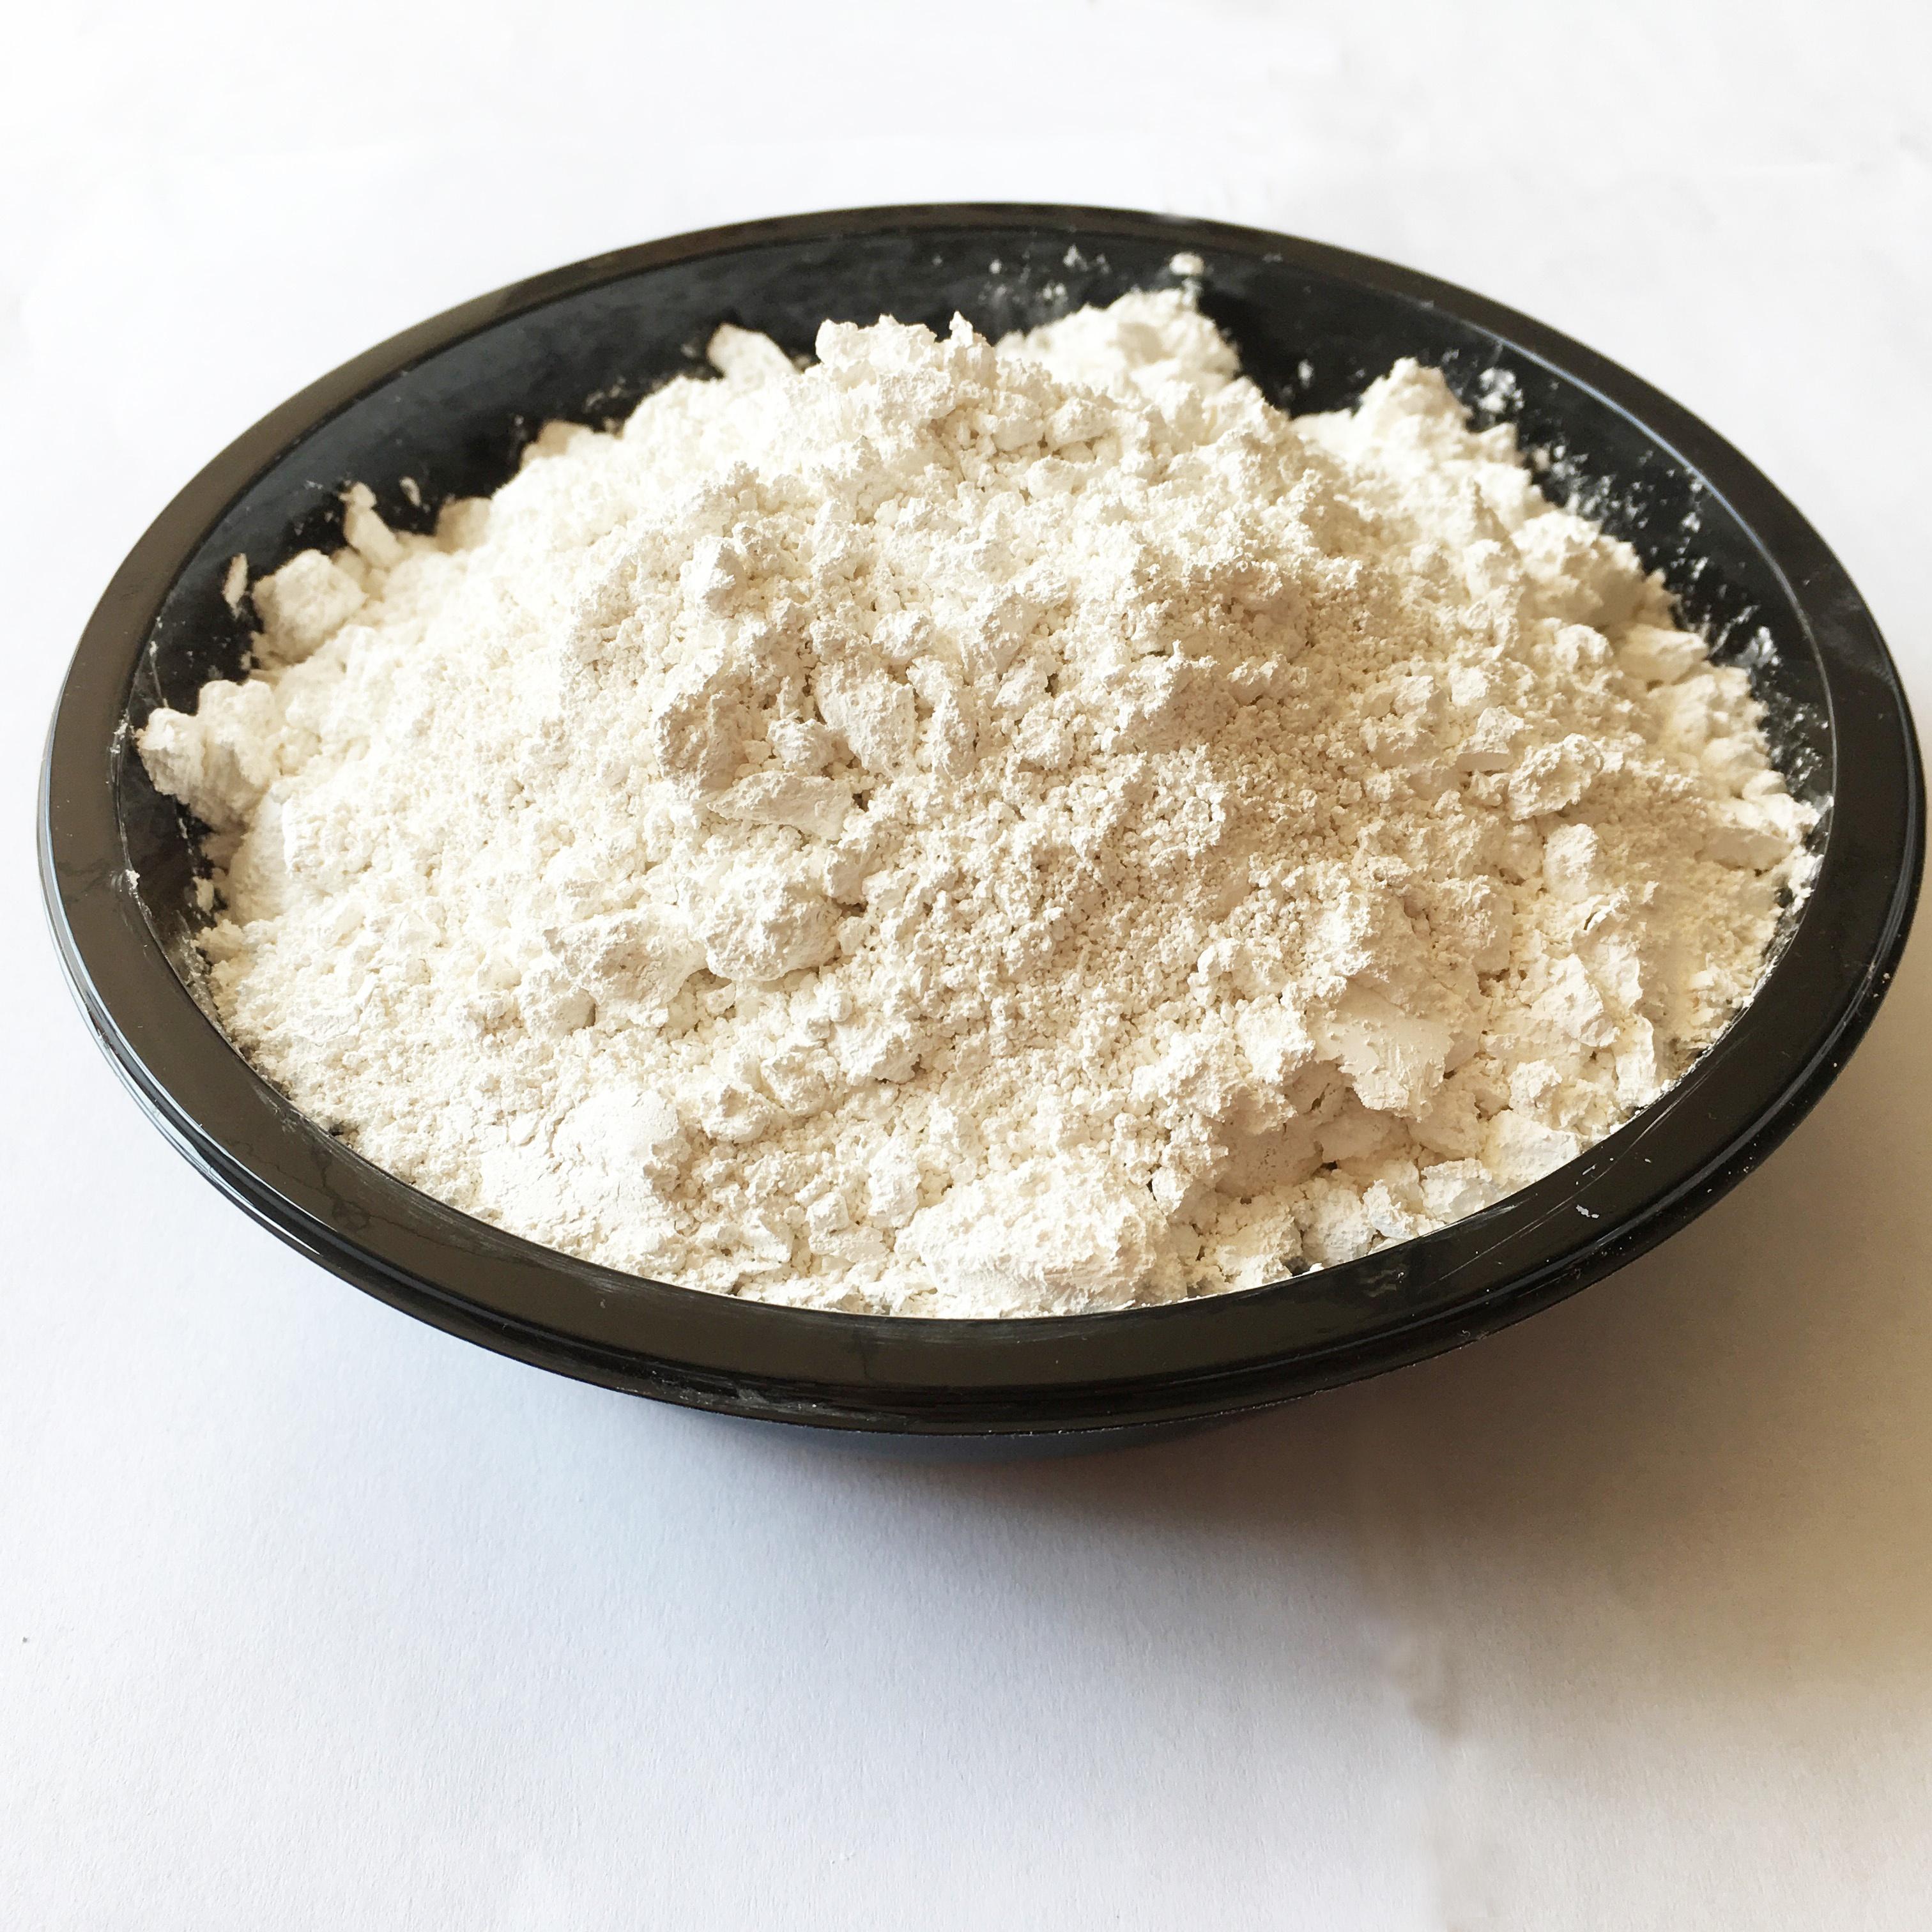 Rutile Titanium Dioxide Bột Màu Trắng, CI 77891